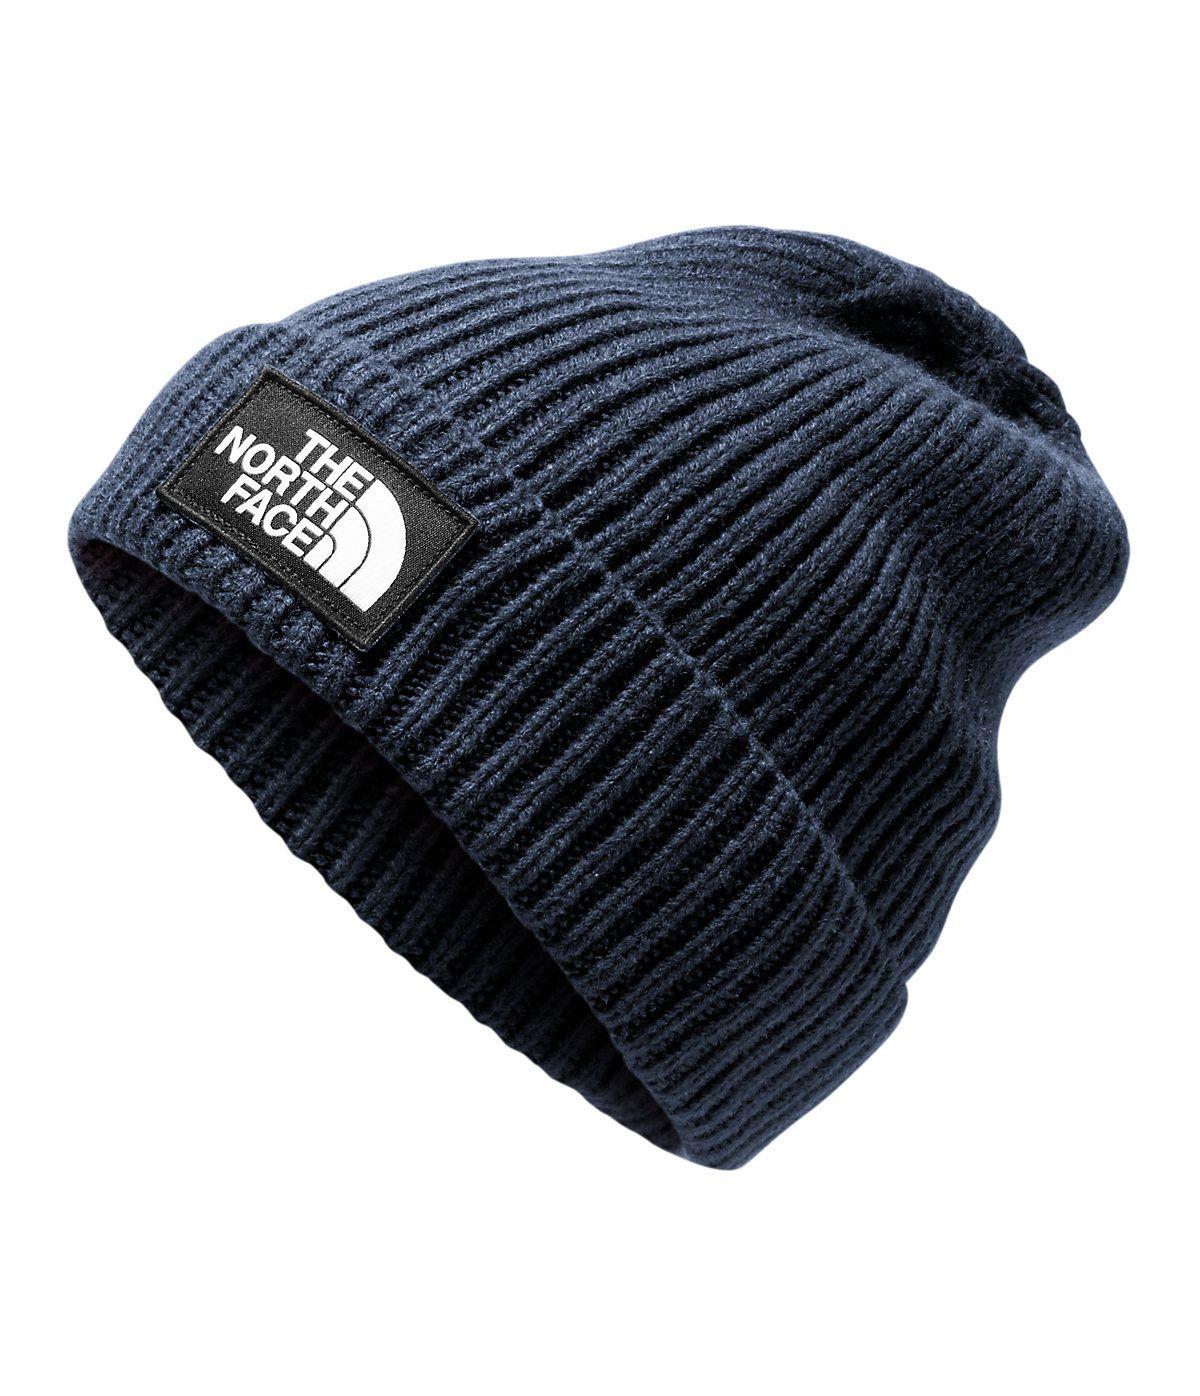 b5d76f89e The North Face Men's TNF Logo Box Cuffed Beanie Hat in 2019 ...